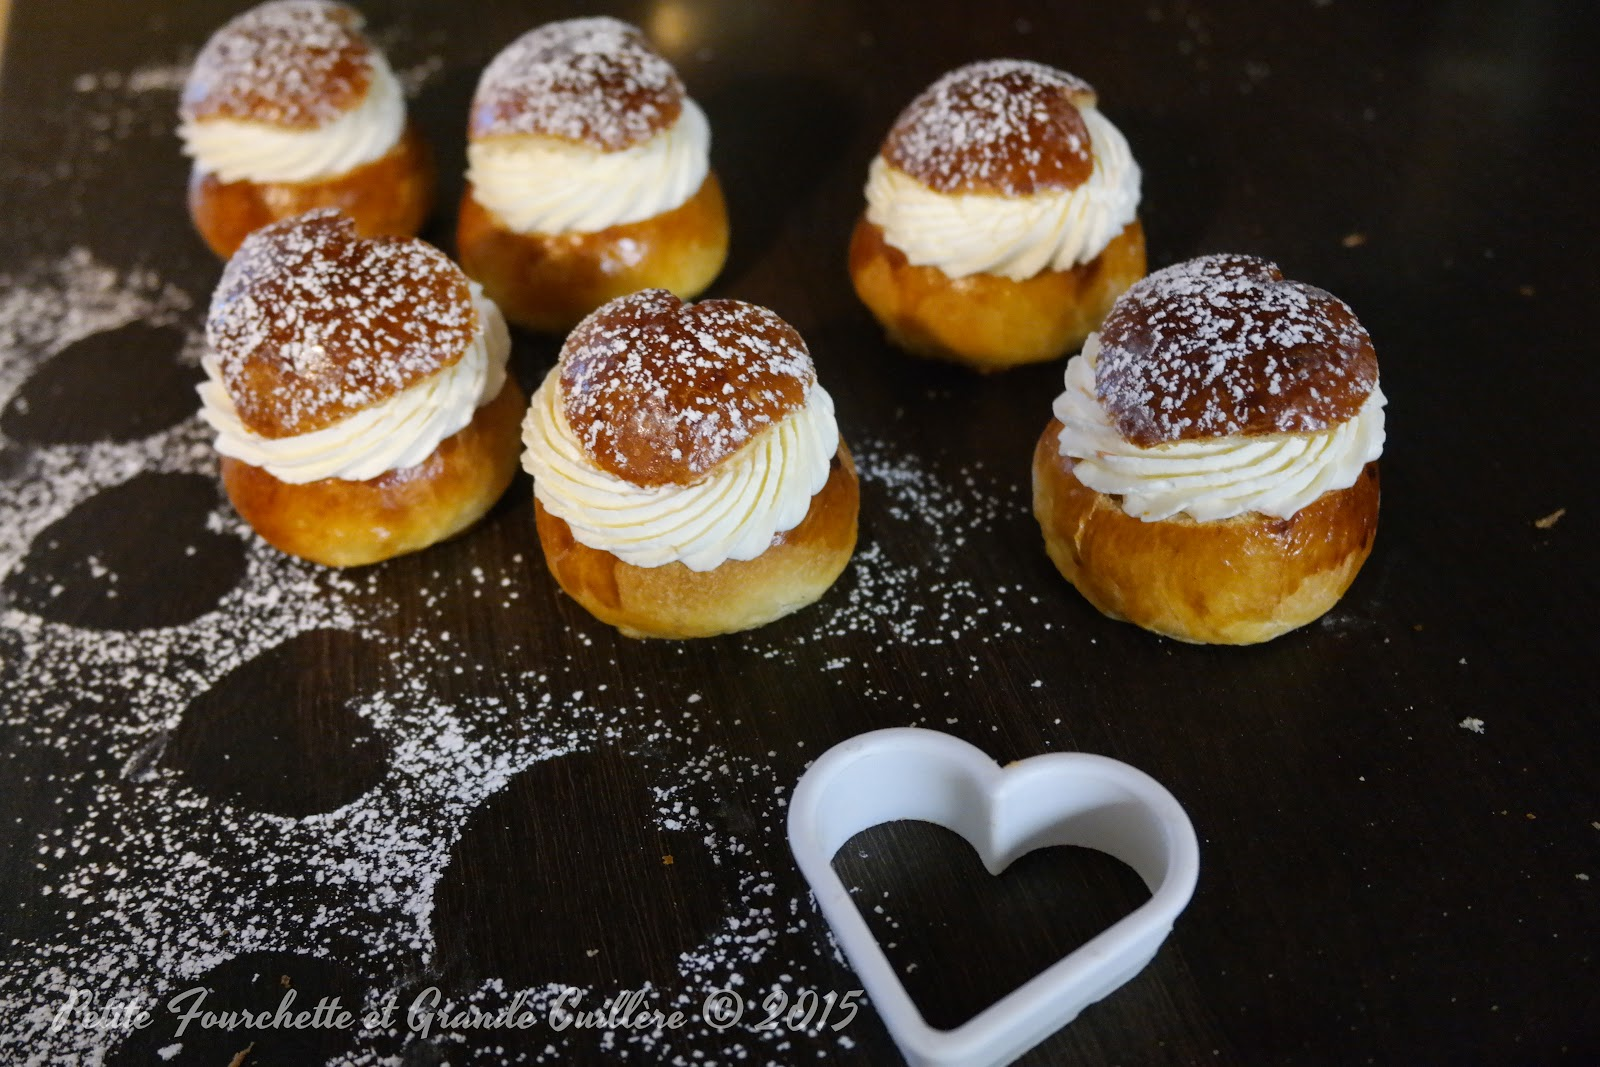 Petite Fourchette et Grande Cuillère - Semlor